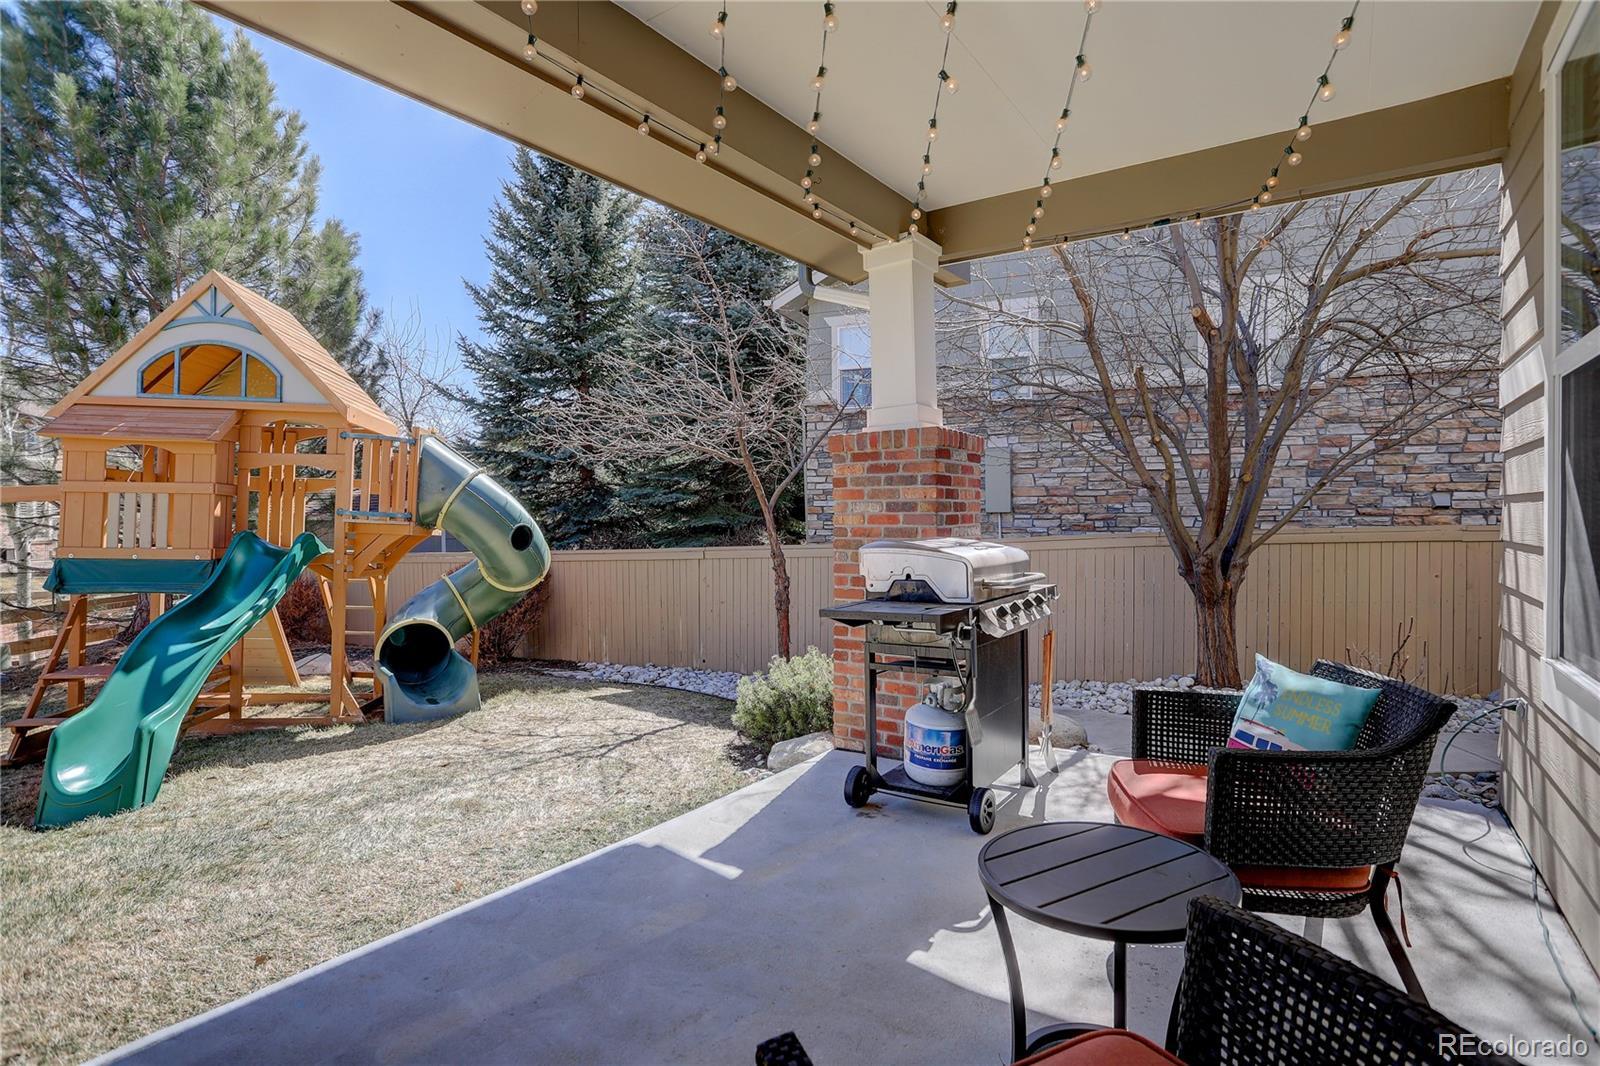 MLS# 3656997 - 30 - 10670 Addison Court, Highlands Ranch, CO 80126